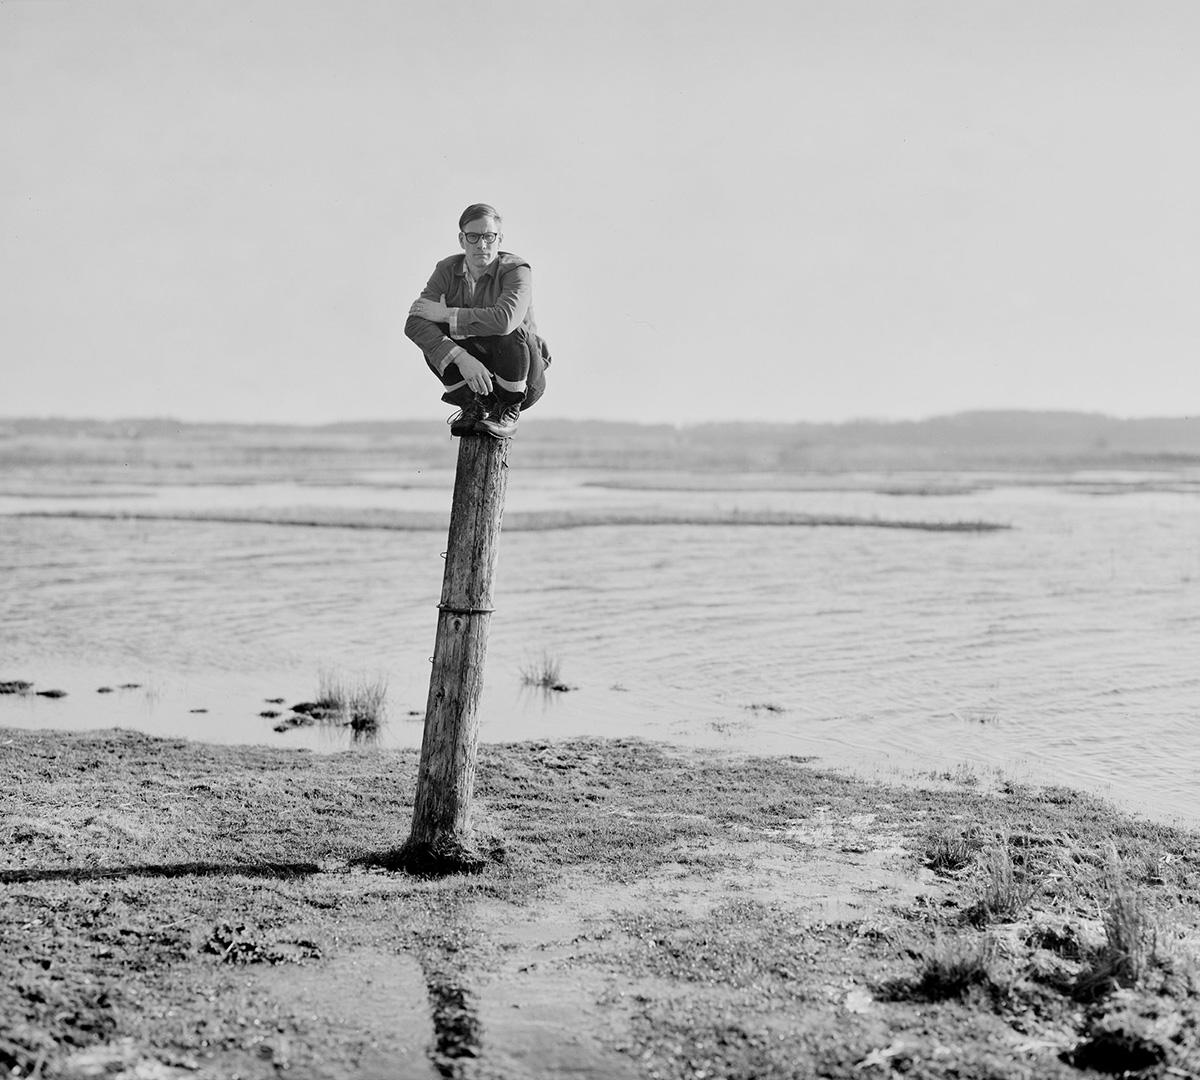 Analog Helg – Fota, Framkalla, Kopiera